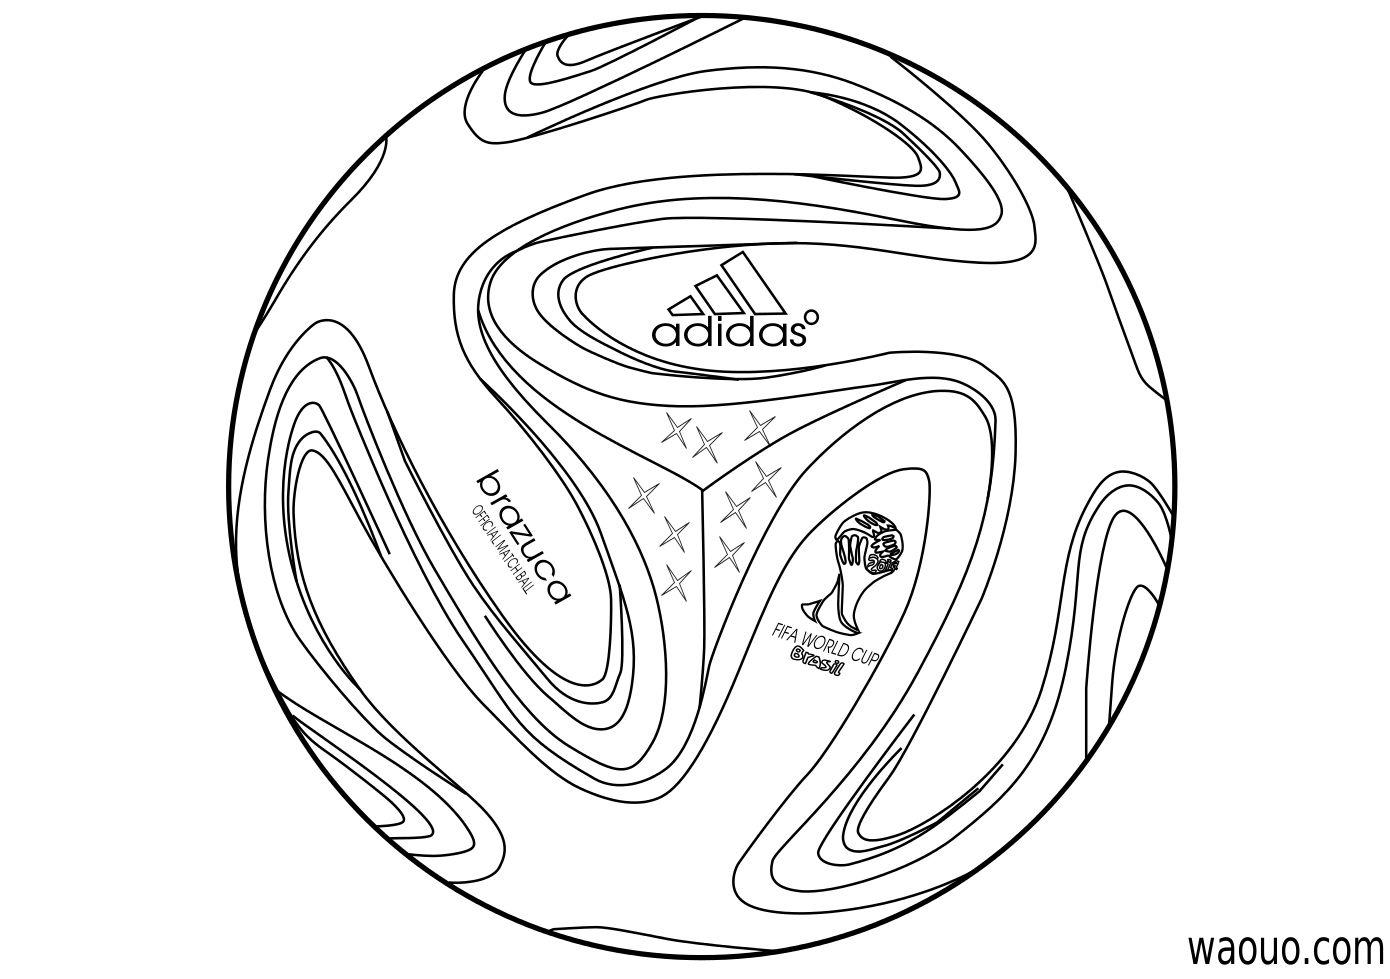 Coloriage Ballon De Foot Coupe Du Monde 2014 Coloriage